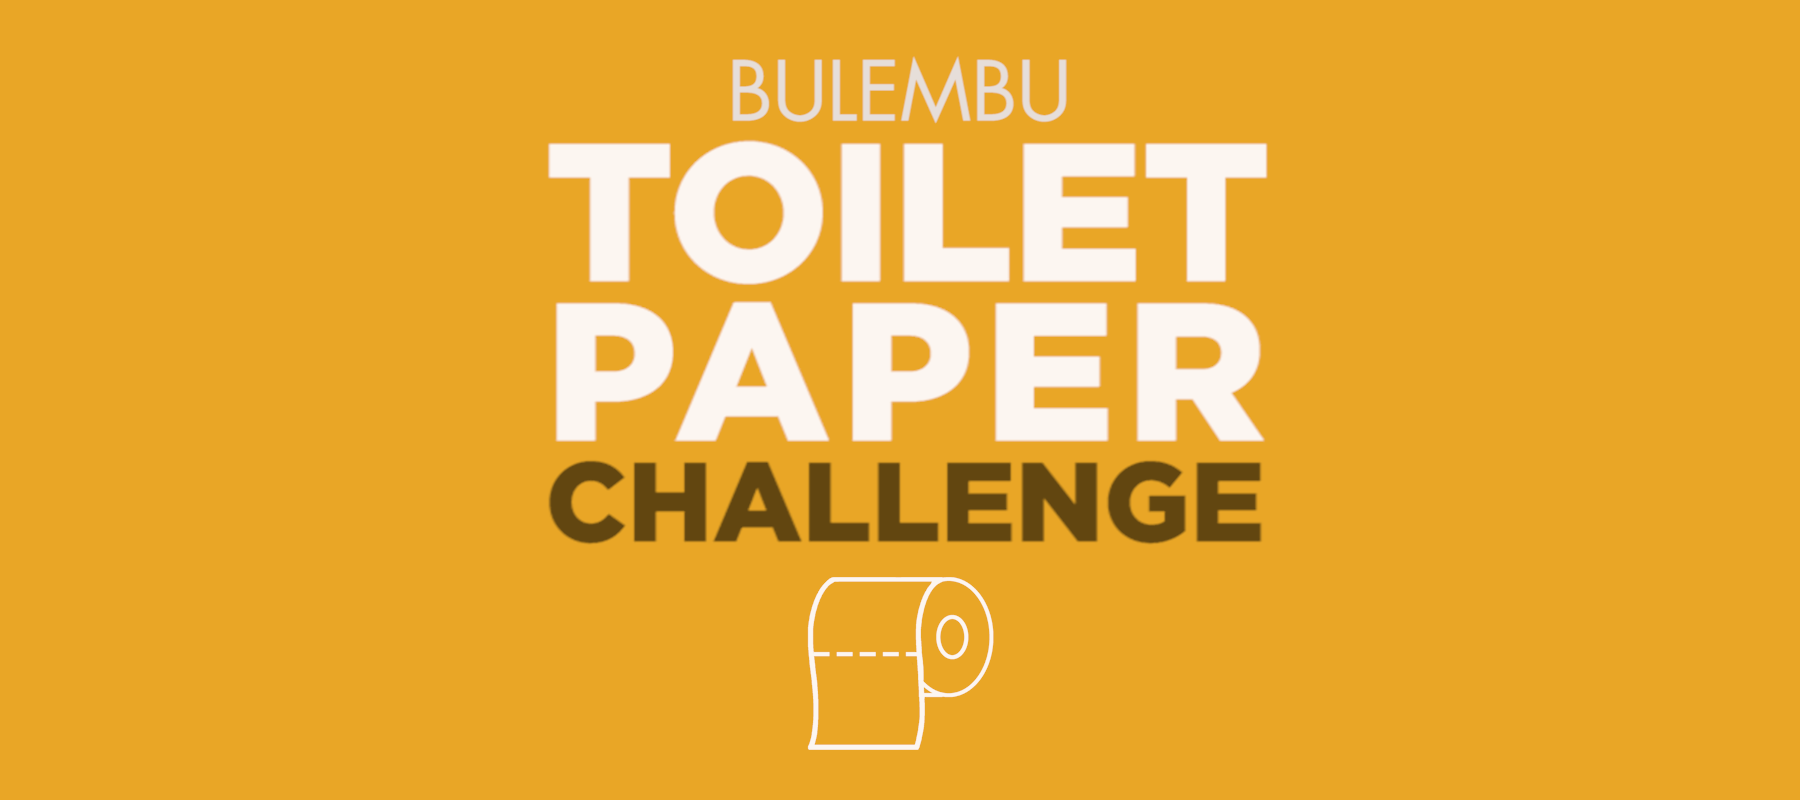 Bulembu Toilet Paper Challenge - Bulembu TP Challenge